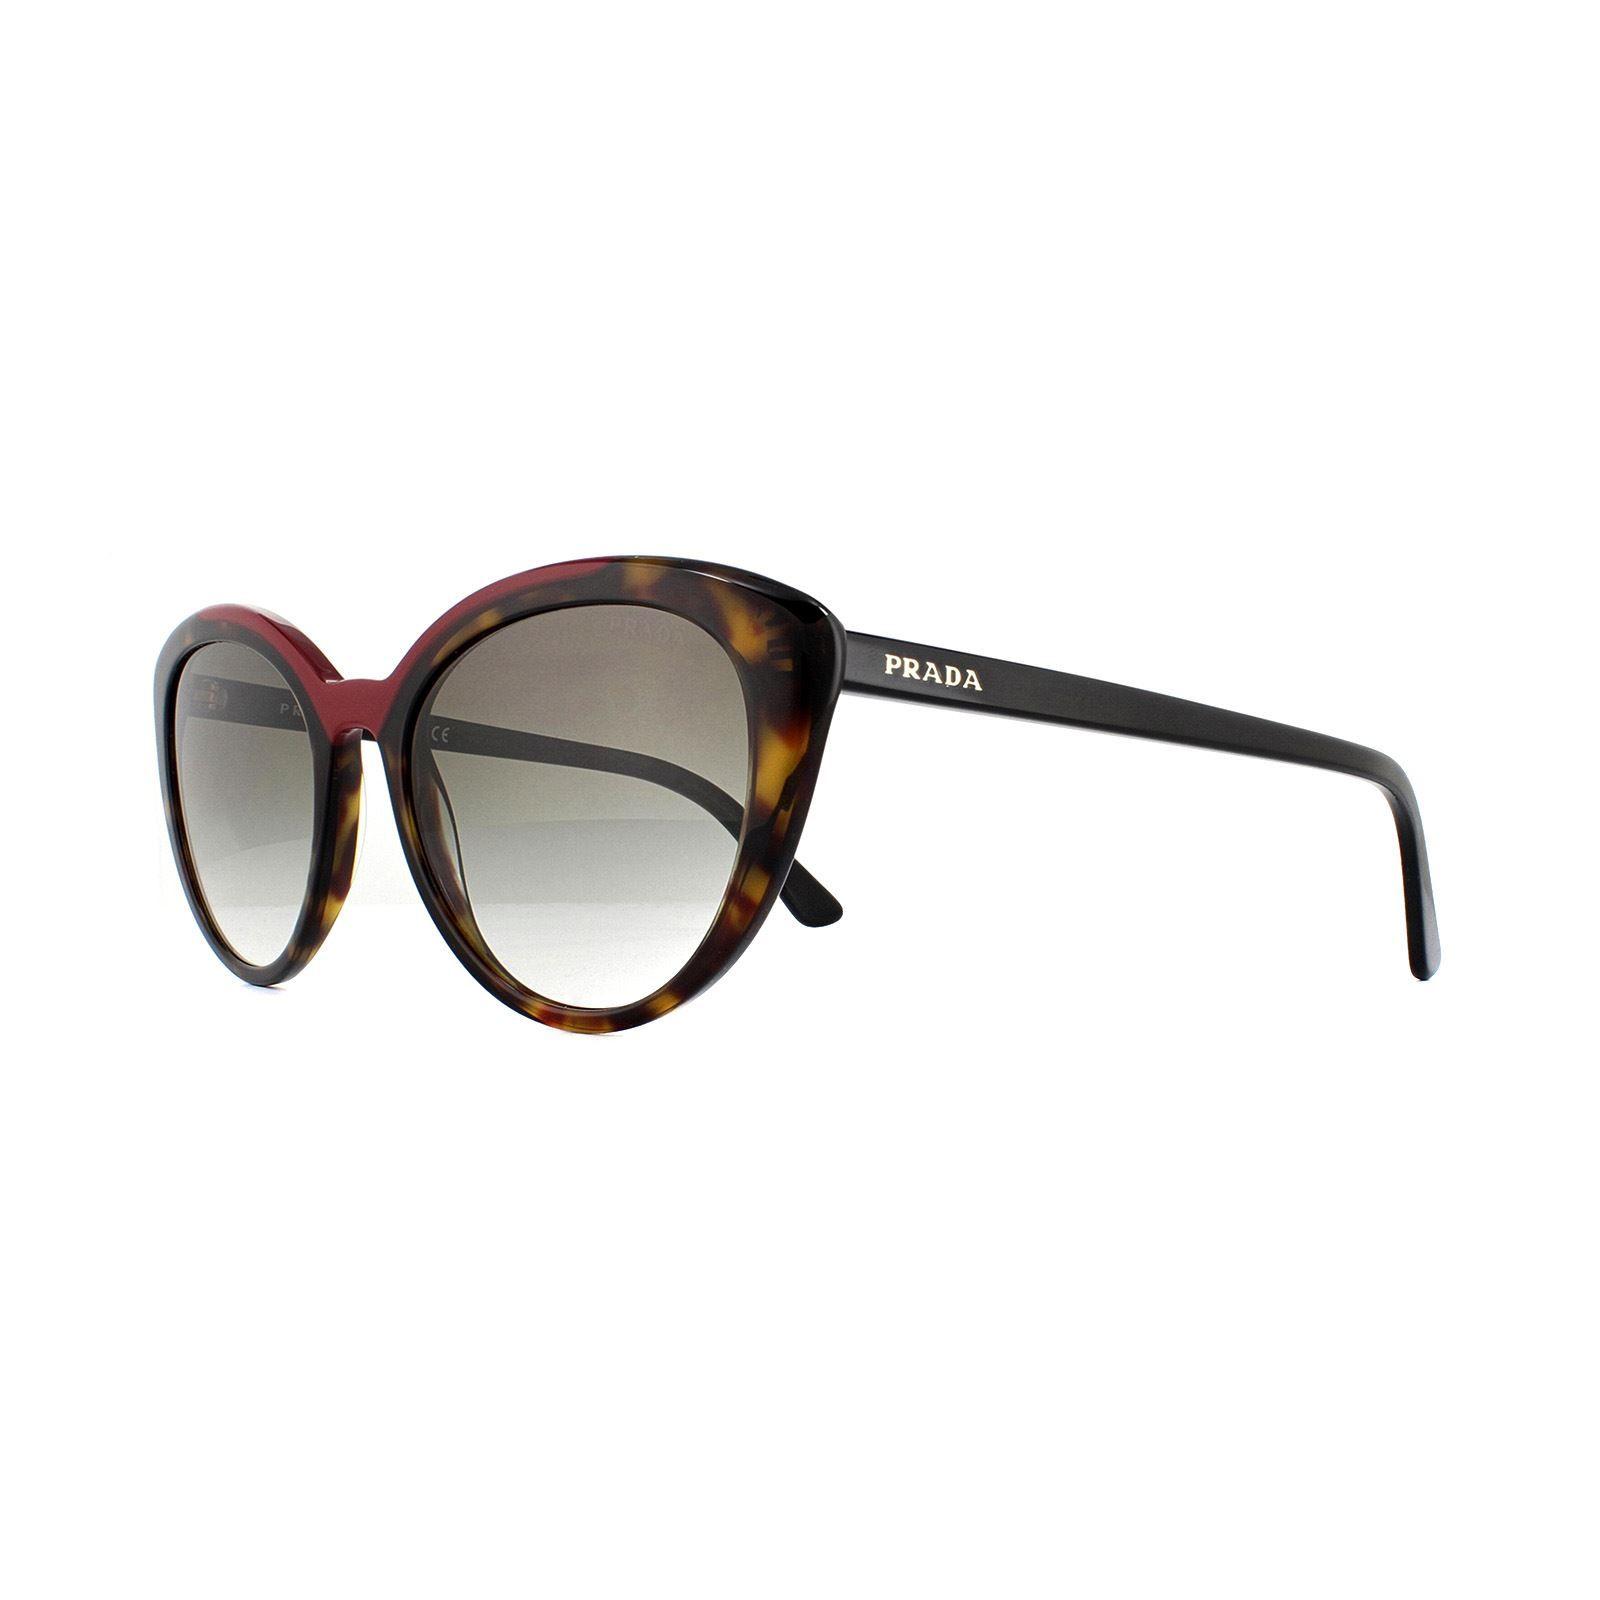 Prada Sunglasses PR 02VS 3200A7 Havana Red Grey Gradient